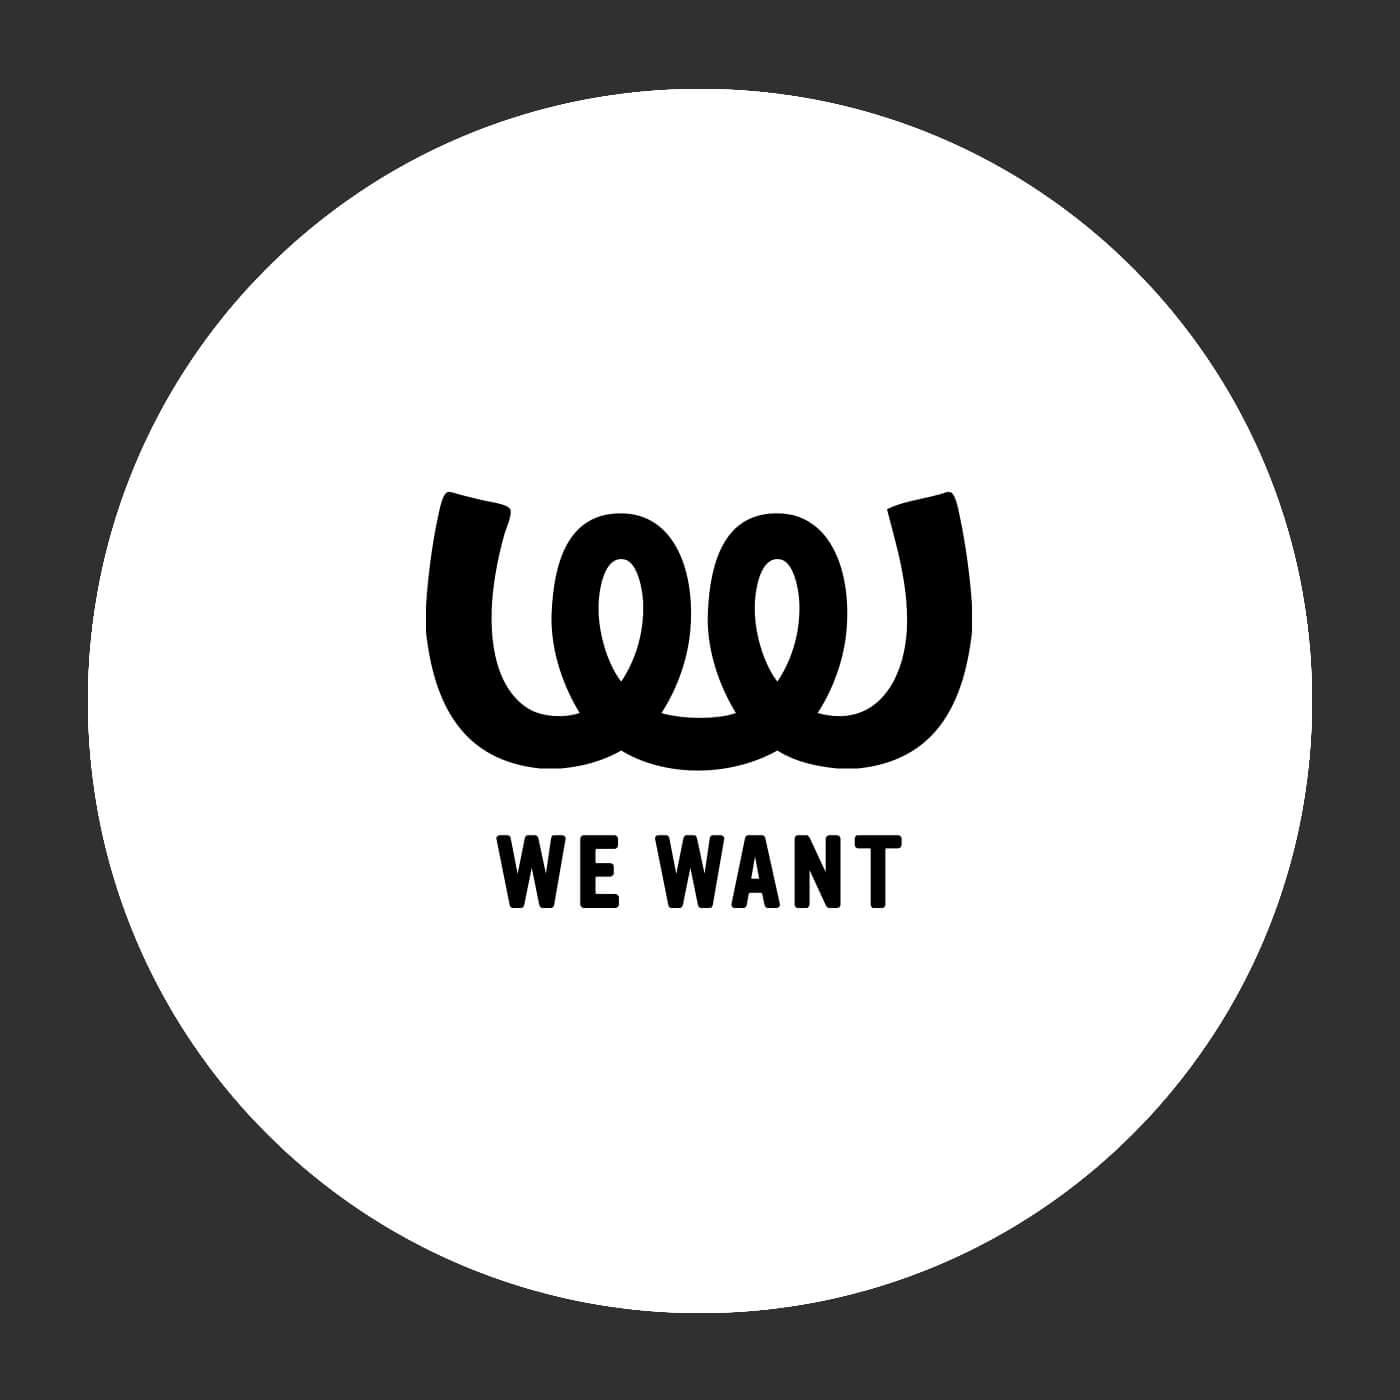 wewant_weiss